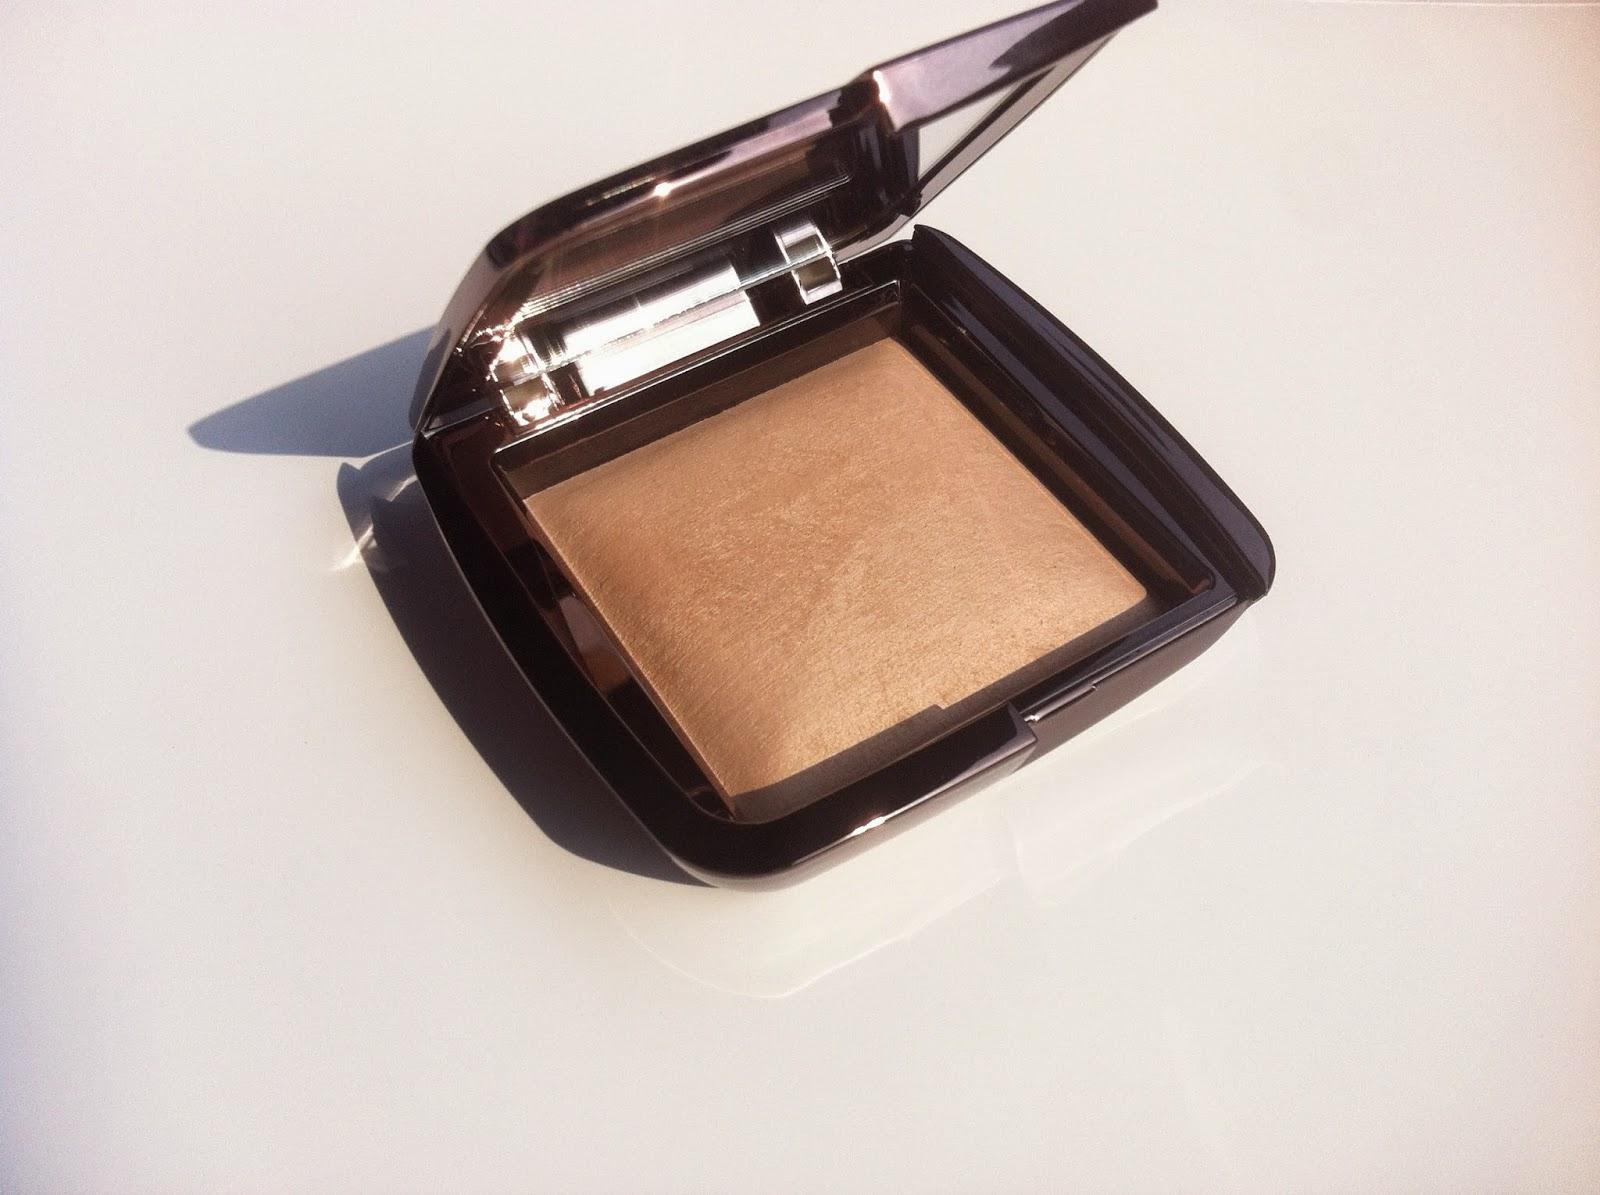 hourglass cosmetics italia, ambient lighting powder review recensione, hourglass ambient lighting powder dim light swatch